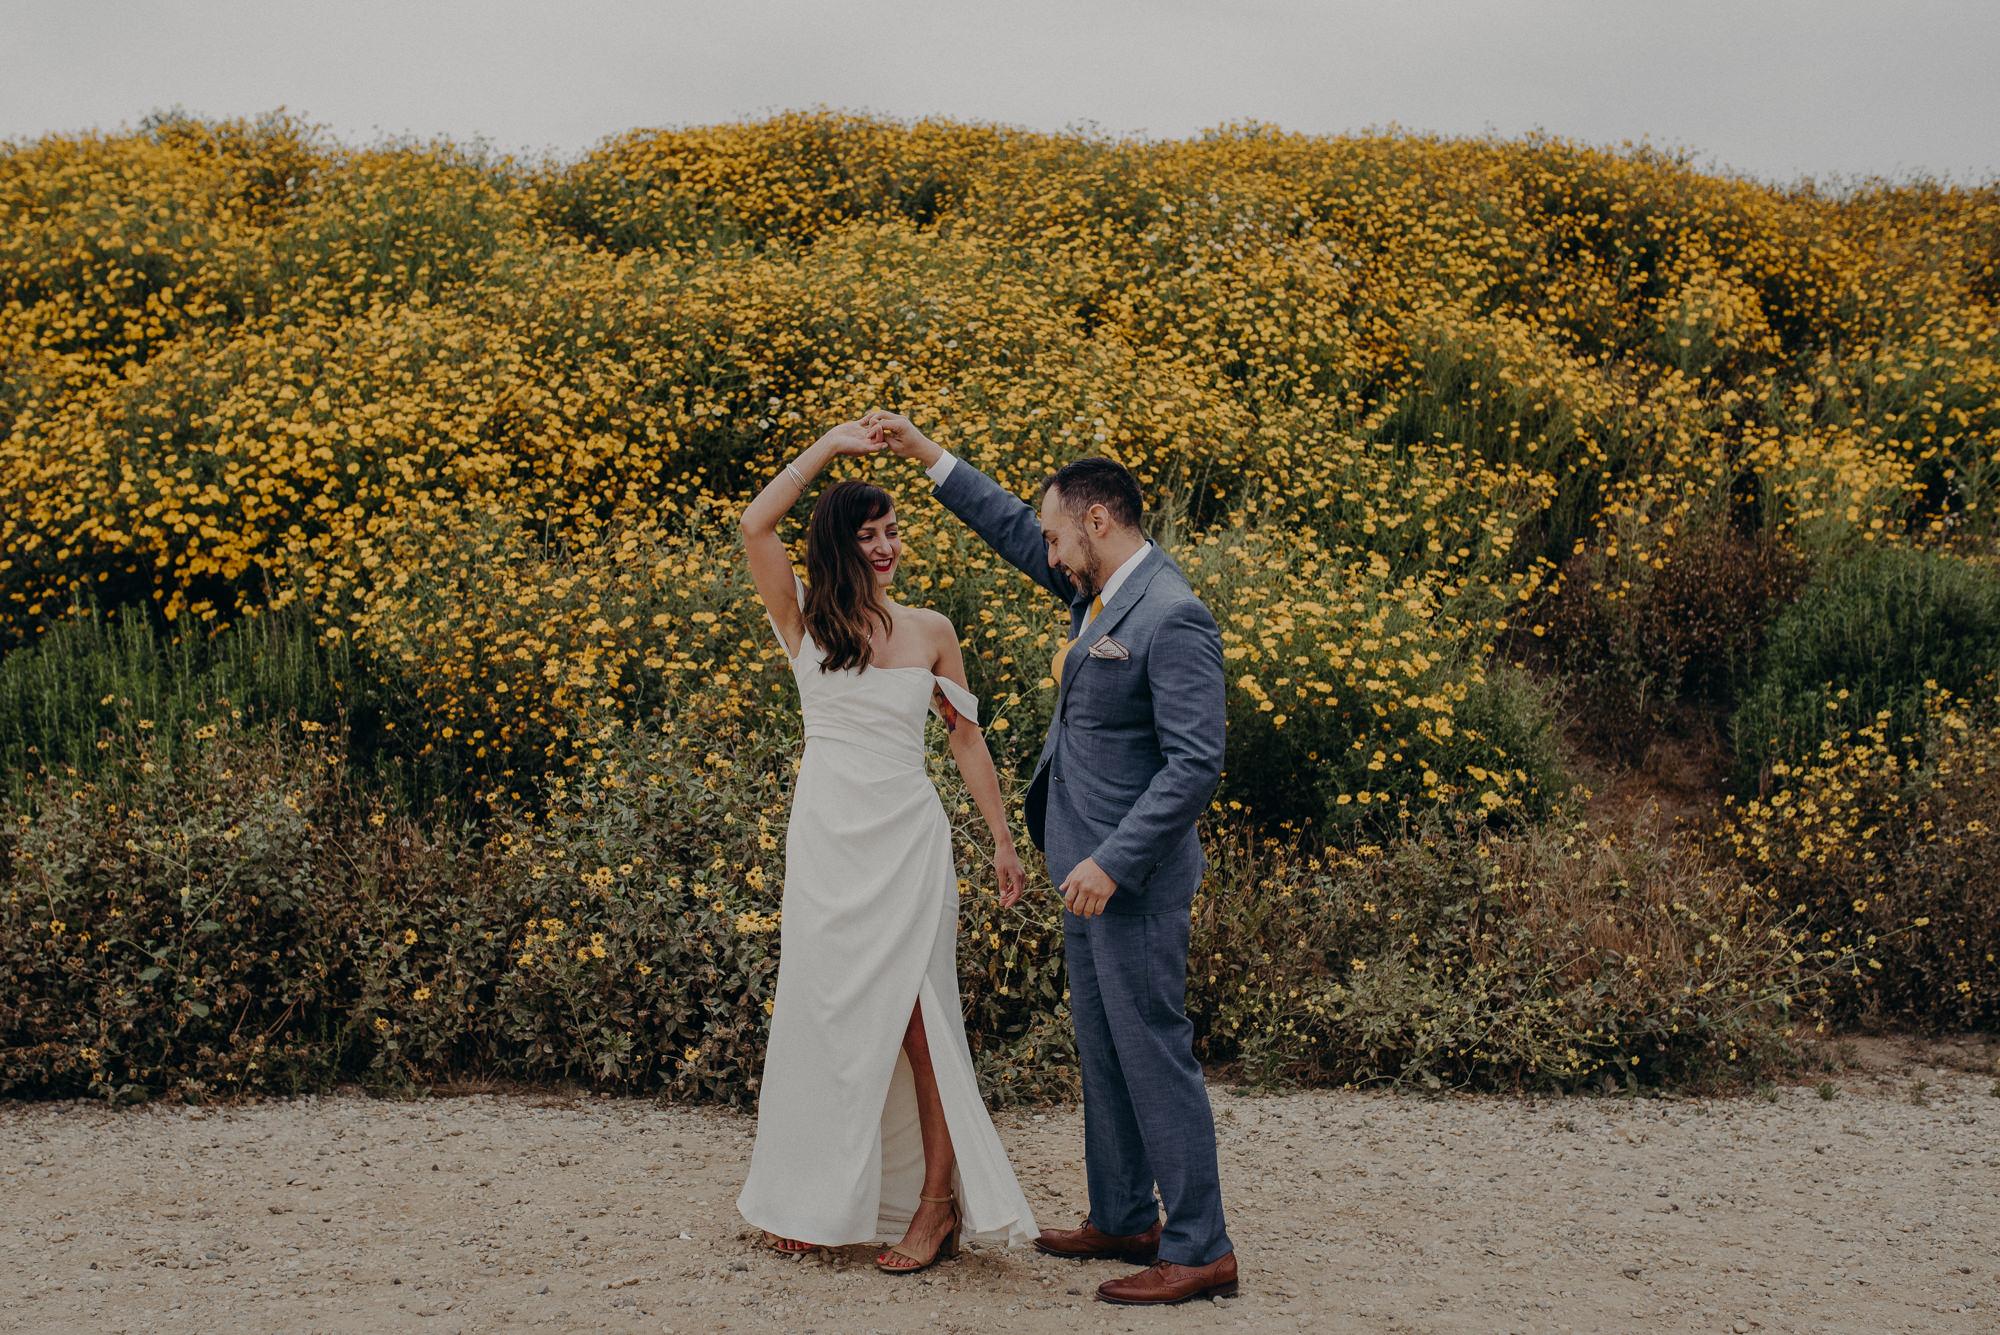 elopement photographer in los angeles - la wedding photographer - isaiahandtaylor.com-012.jpg